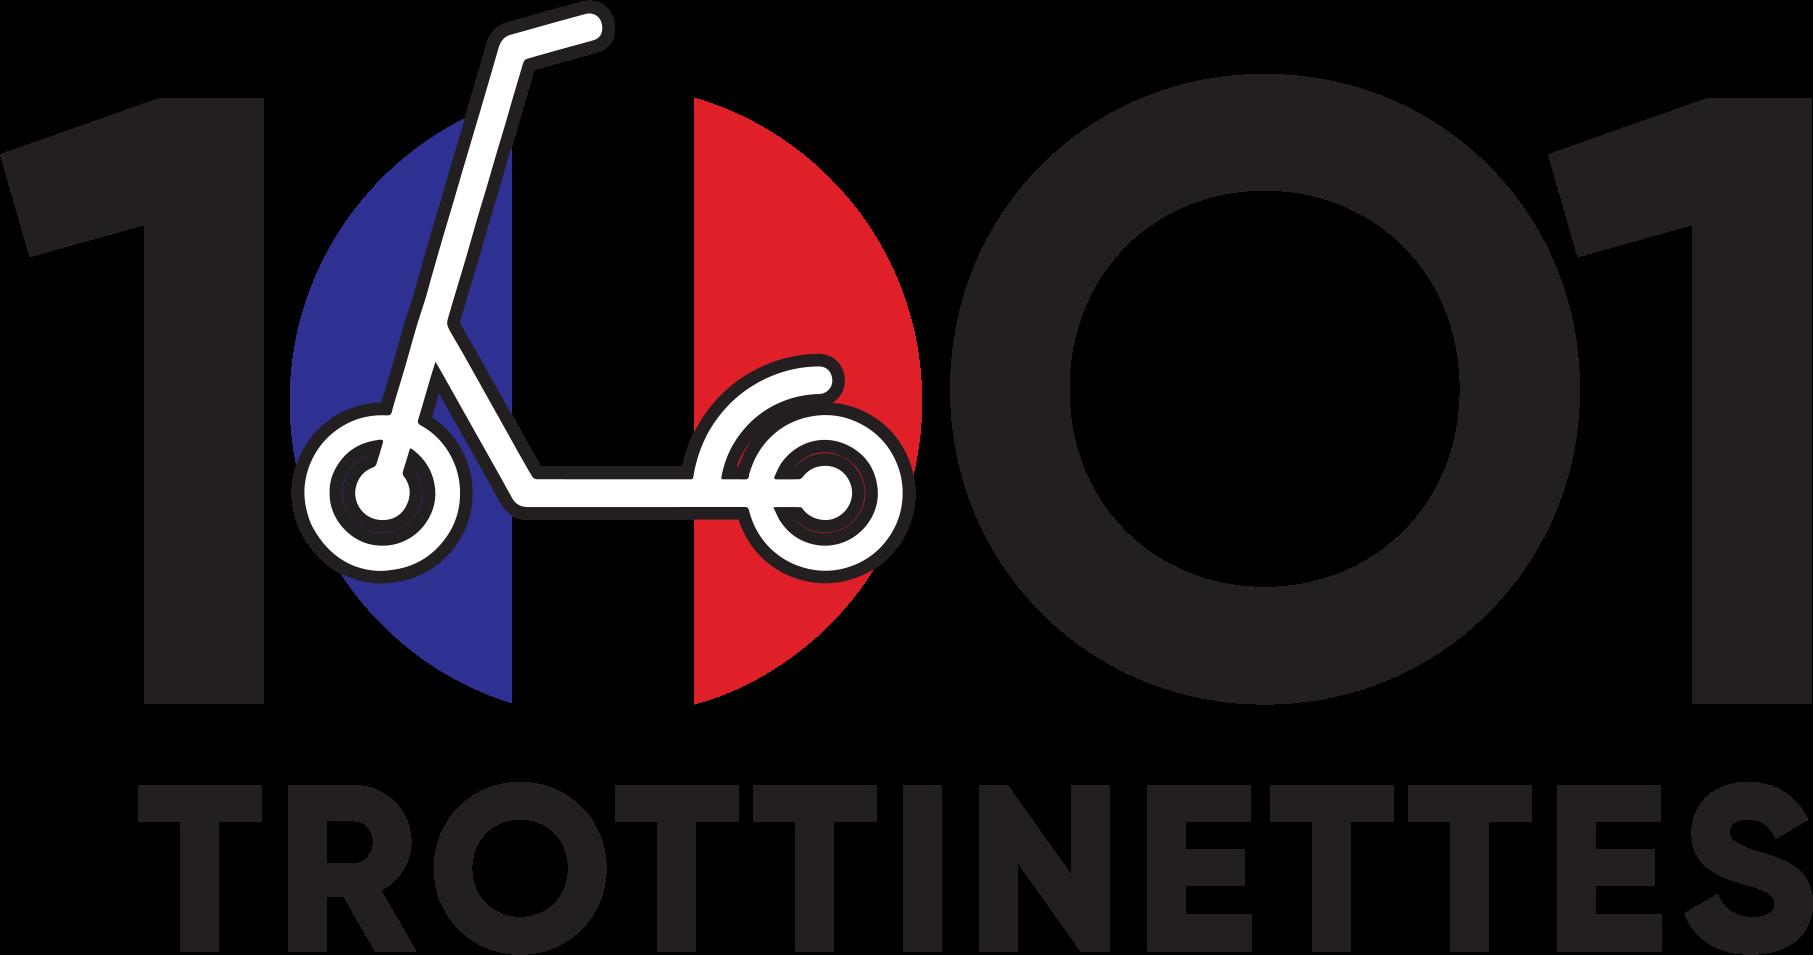 SOS Trottinettes